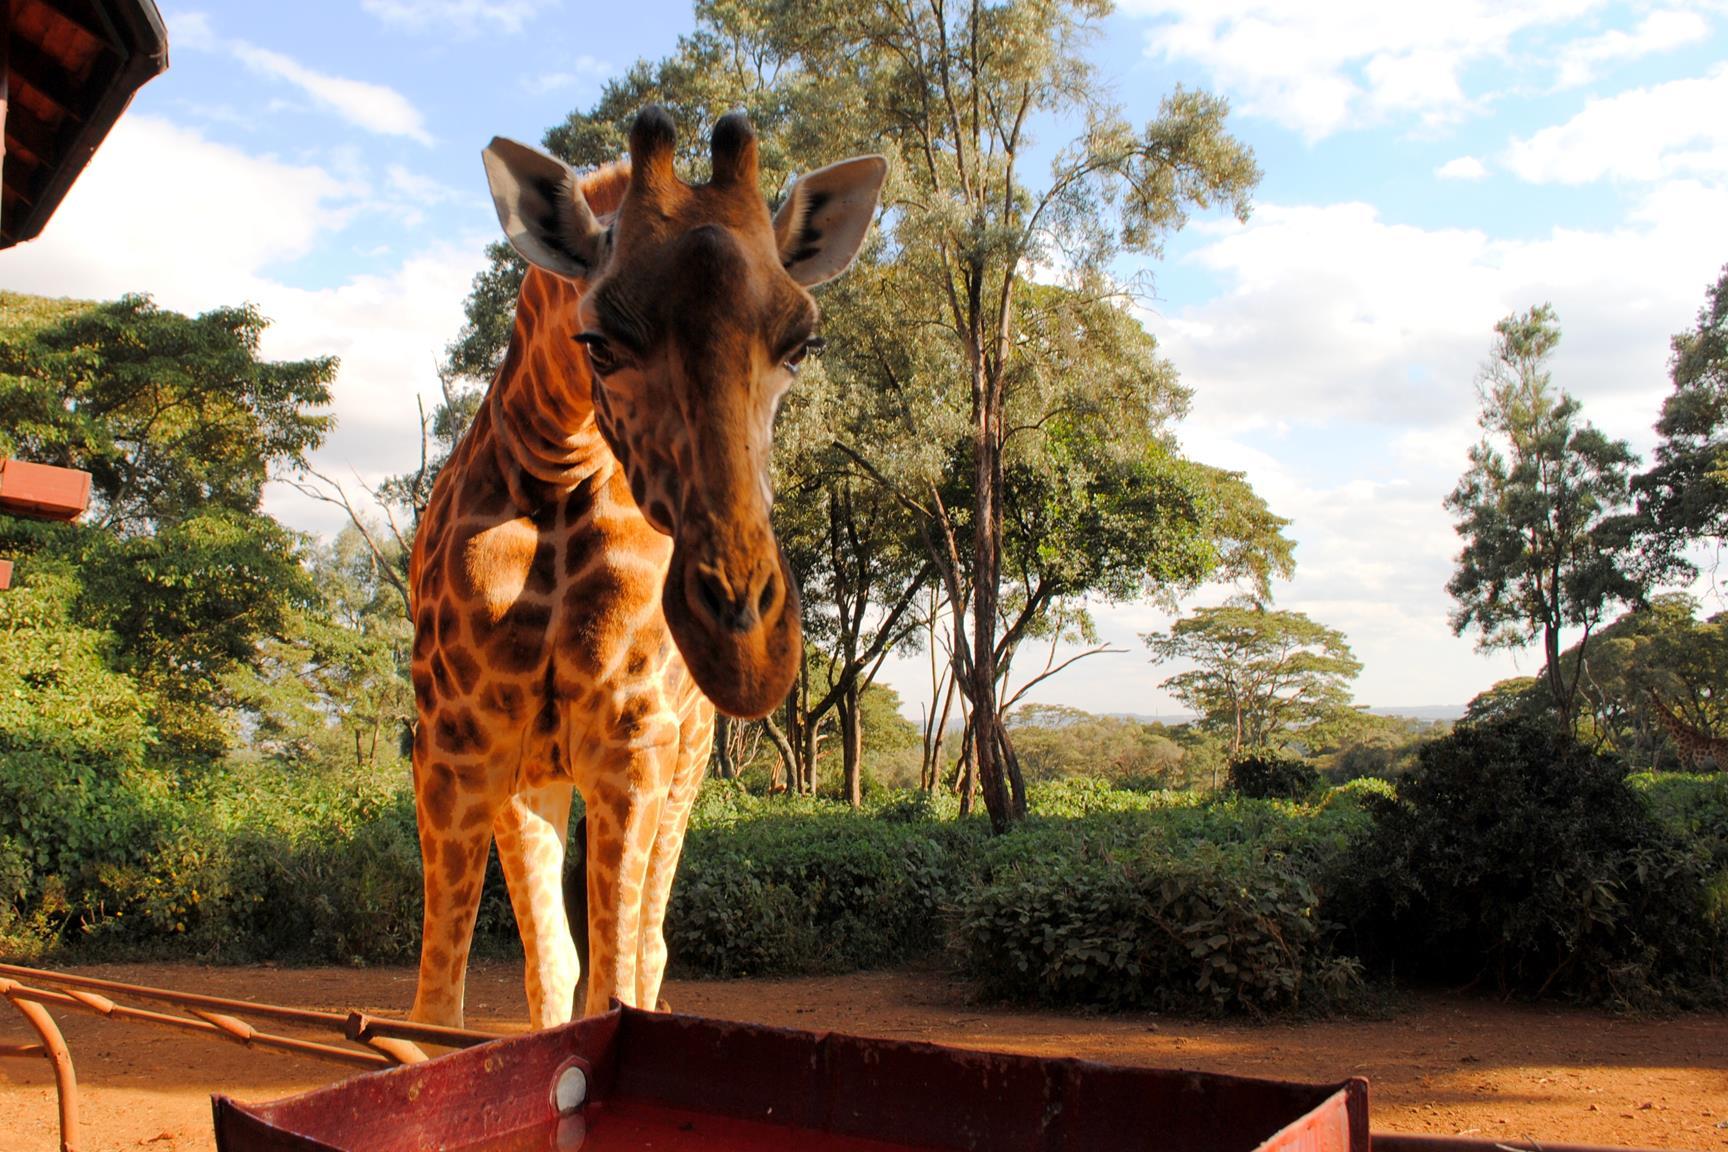 centro-jirafas-nairobi